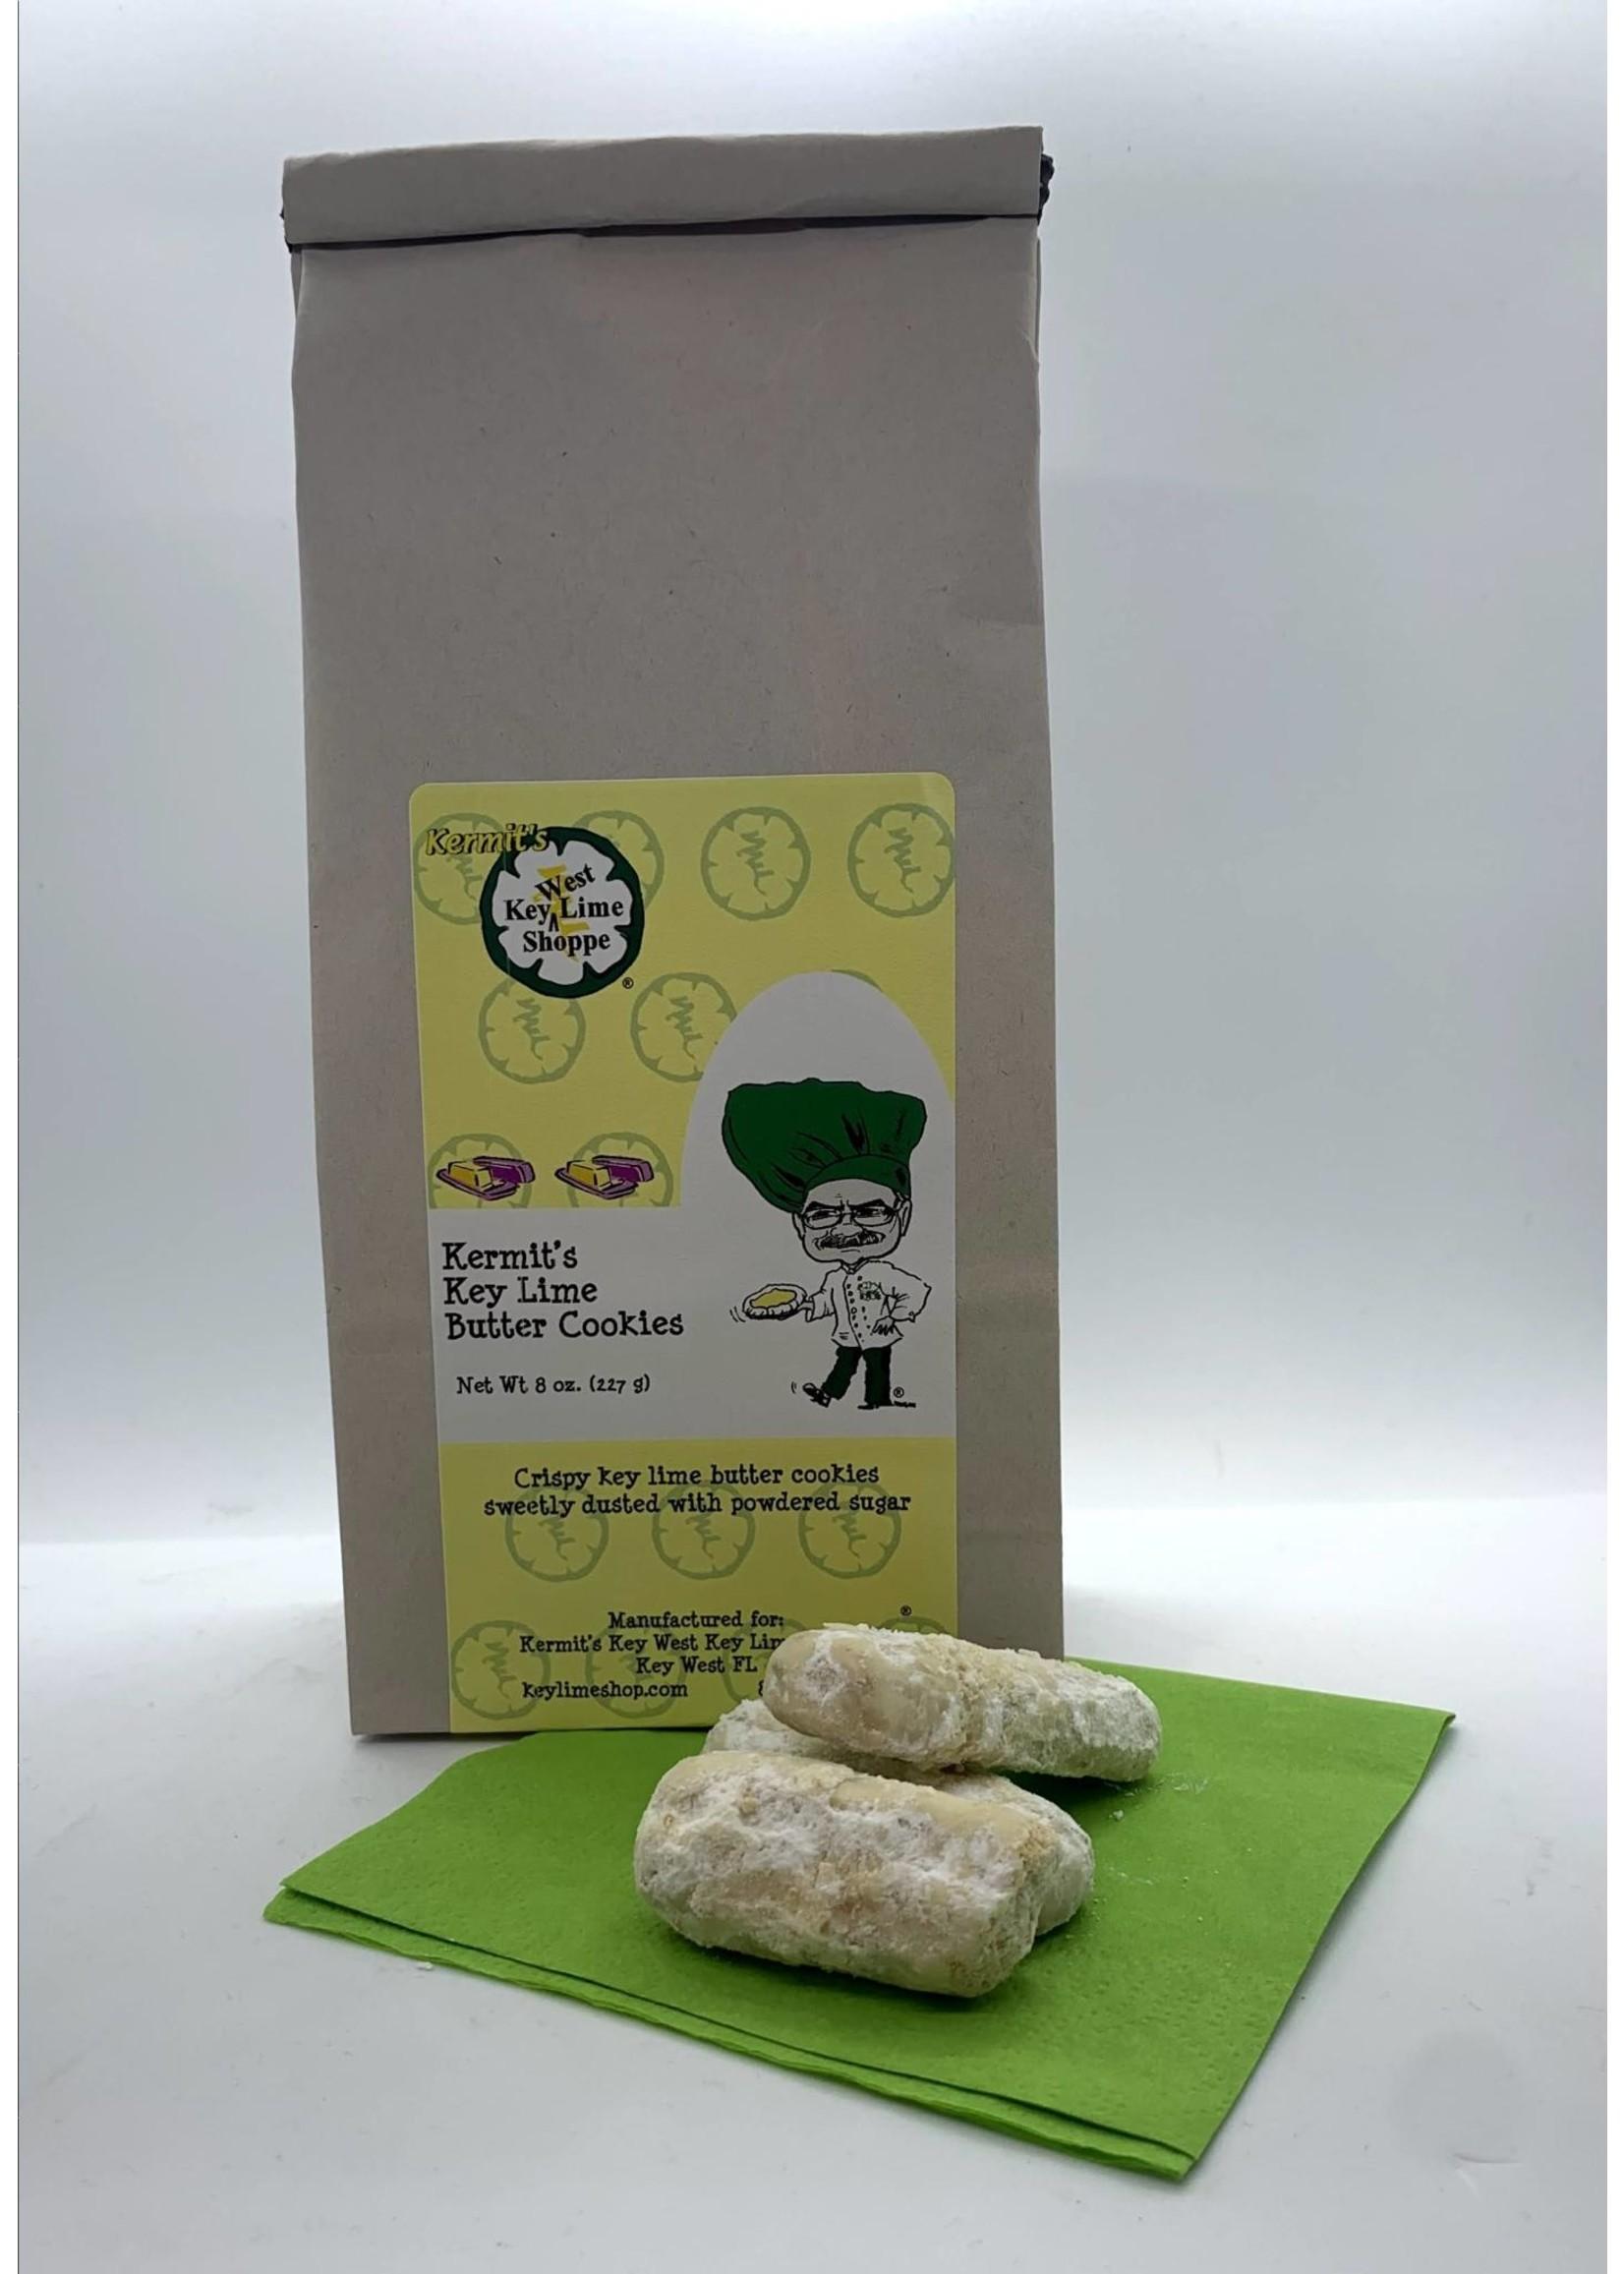 Kermit's Key Lime Butter Cookies 8 oz.